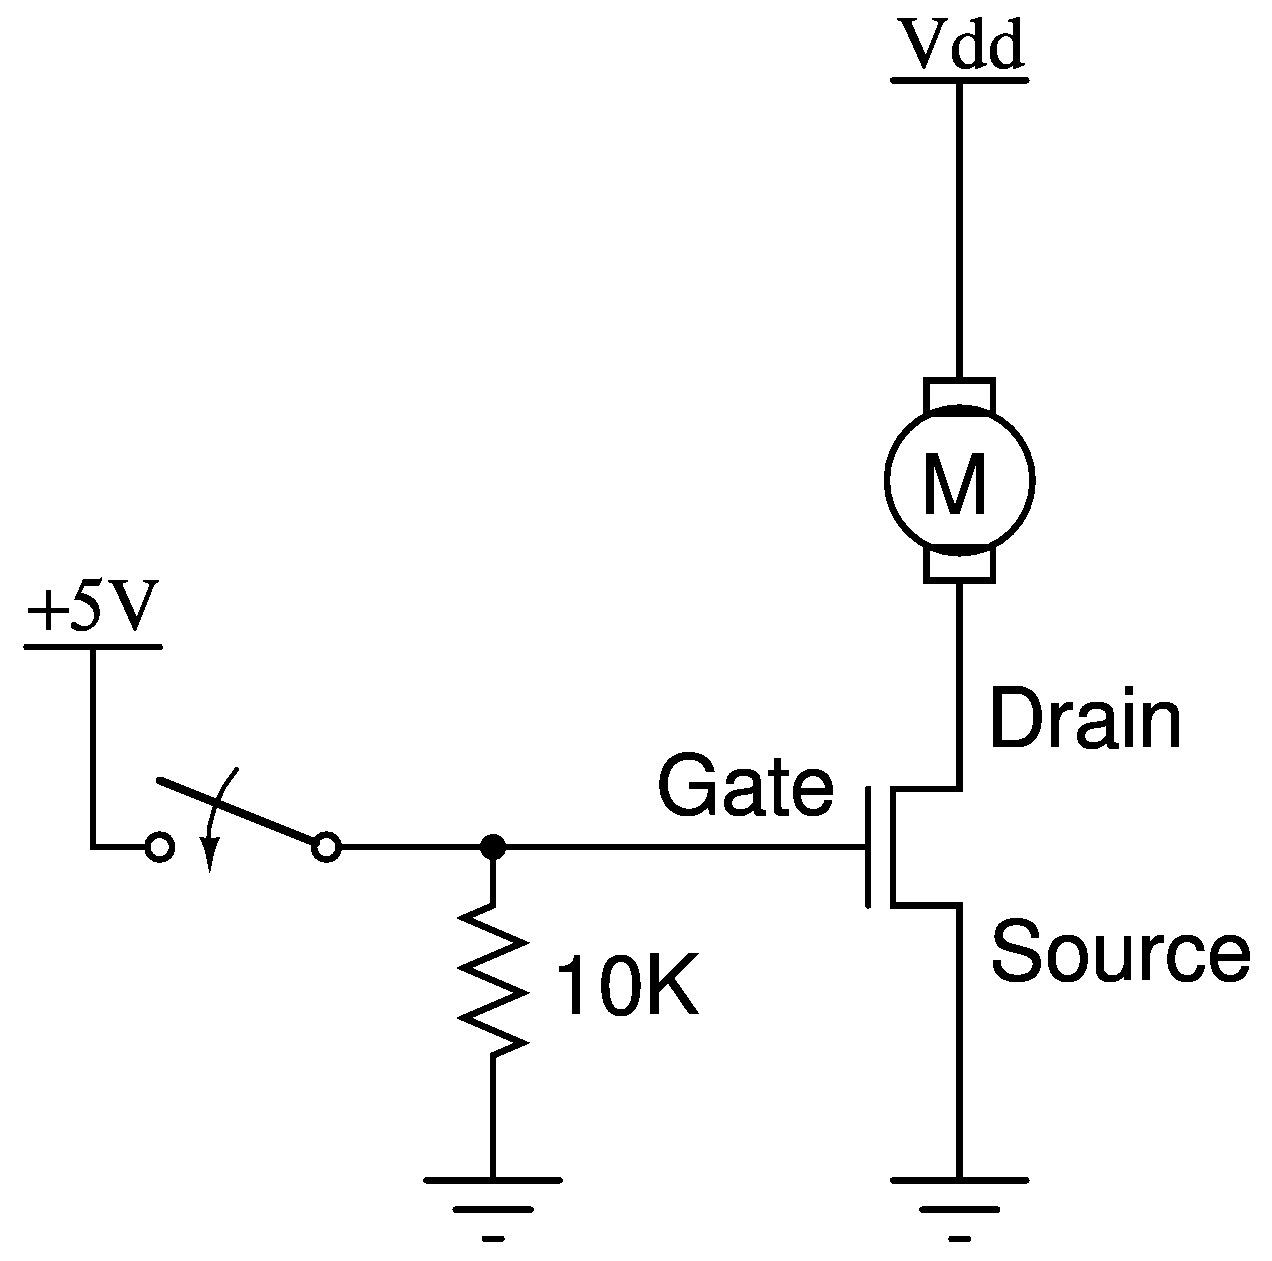 de el-kroeg - deel 4 - modding  mechanica  u0026 elektronica